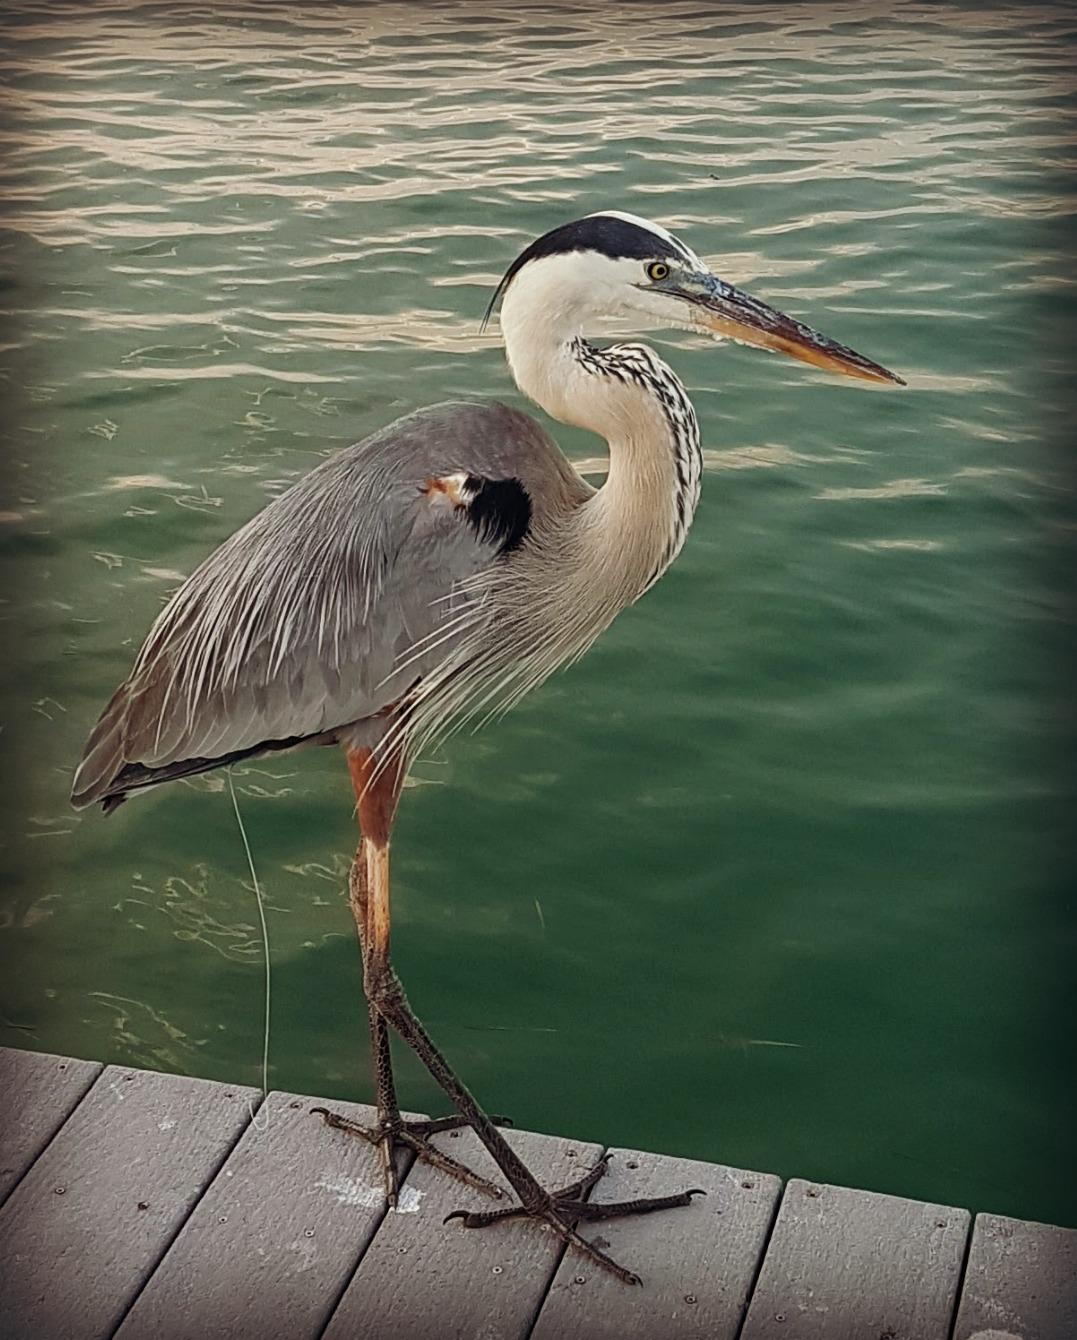 South Seas Island Resort, Captiva Island, Florida